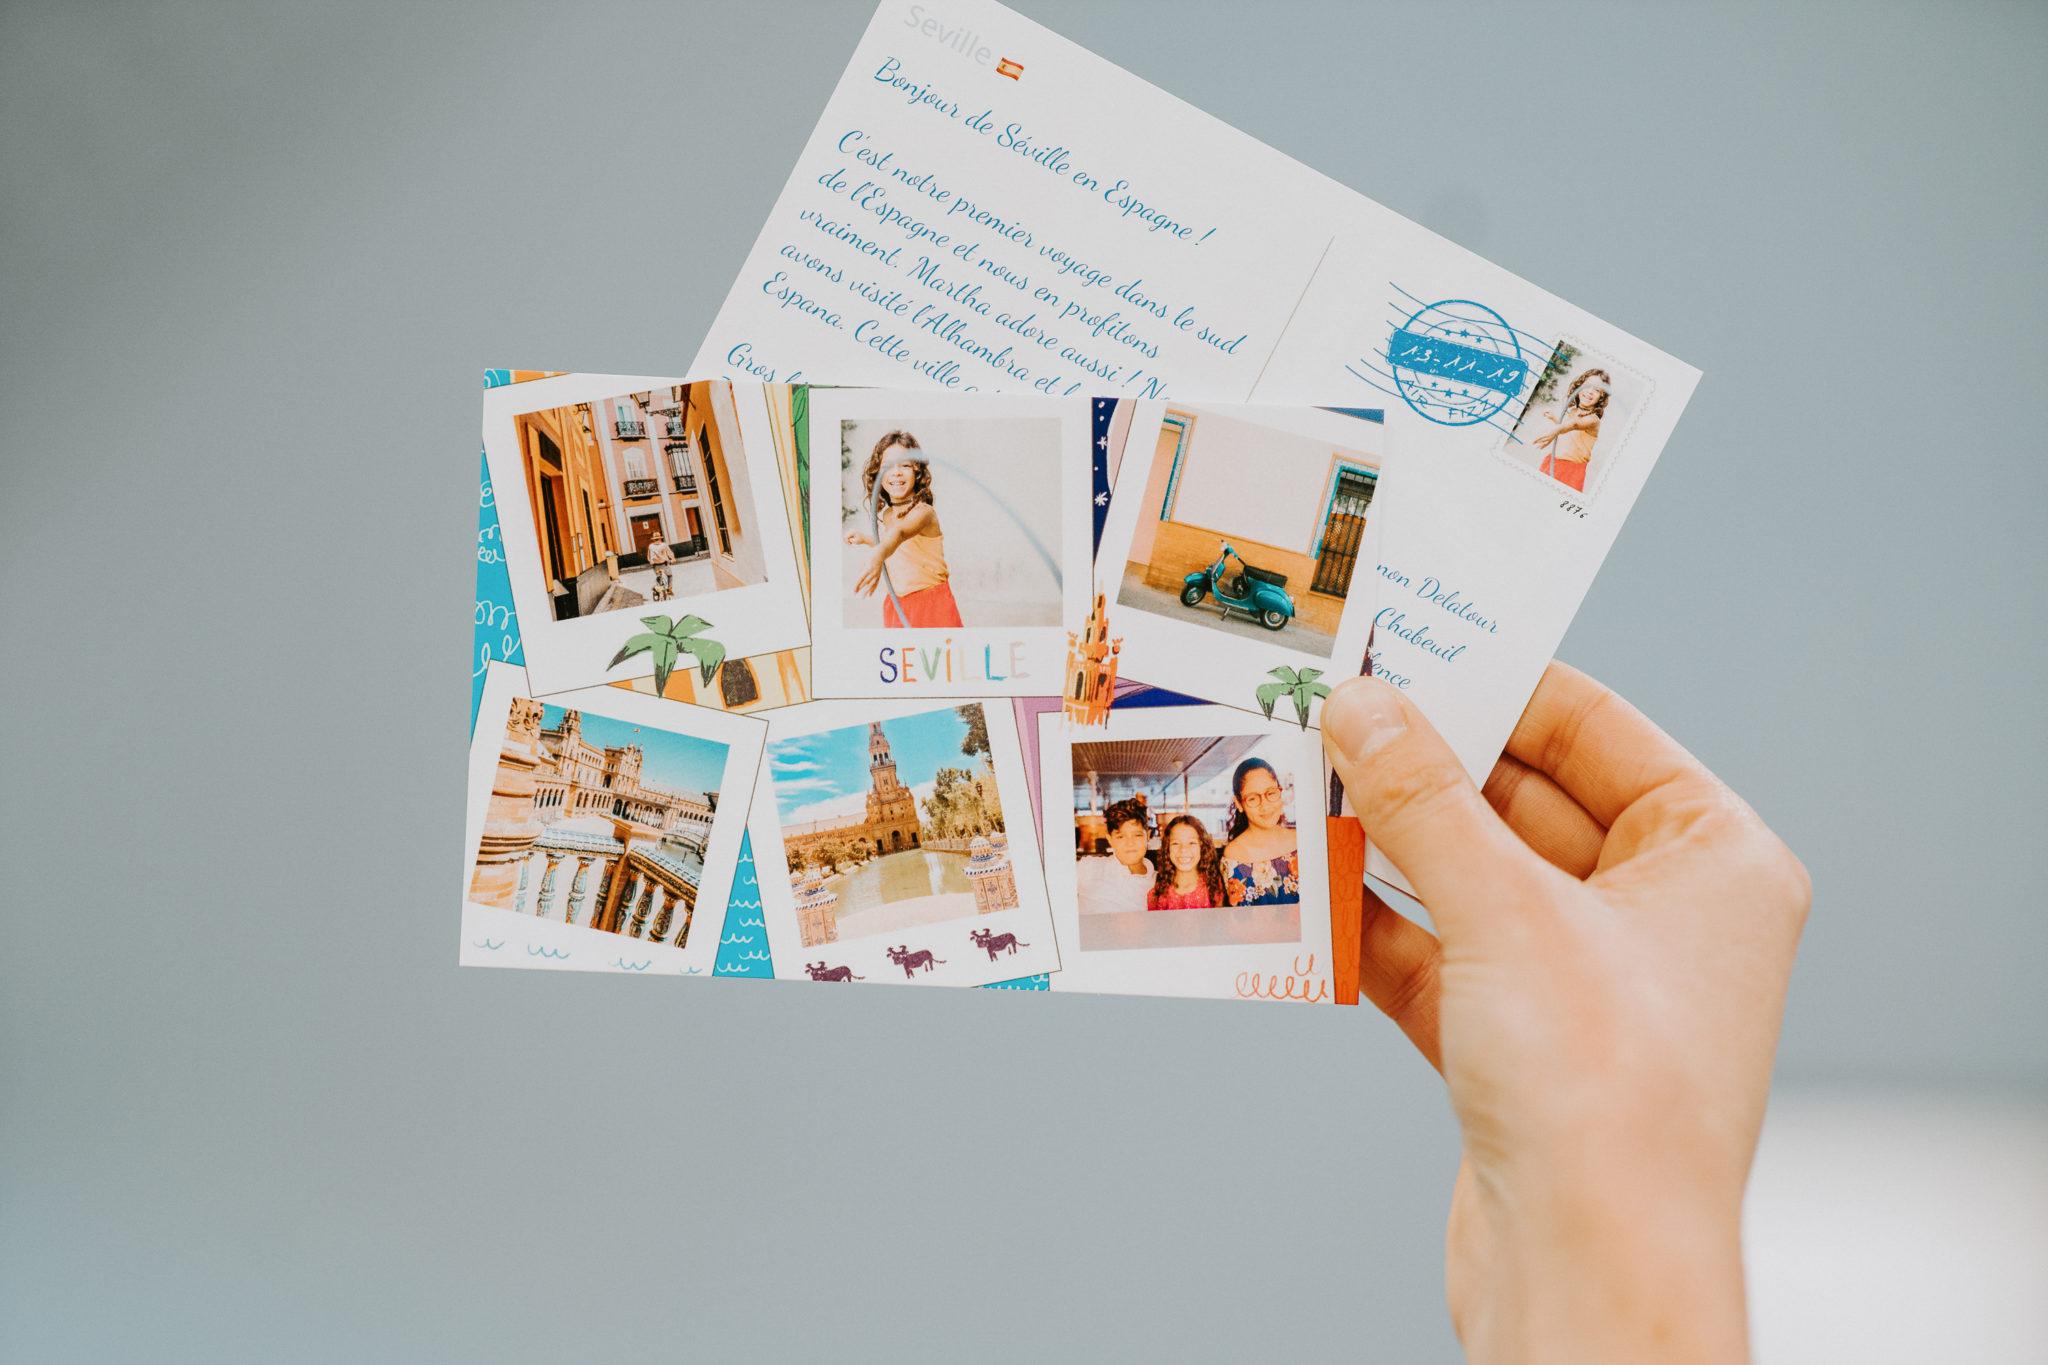 carte postale personnalisee barcelone